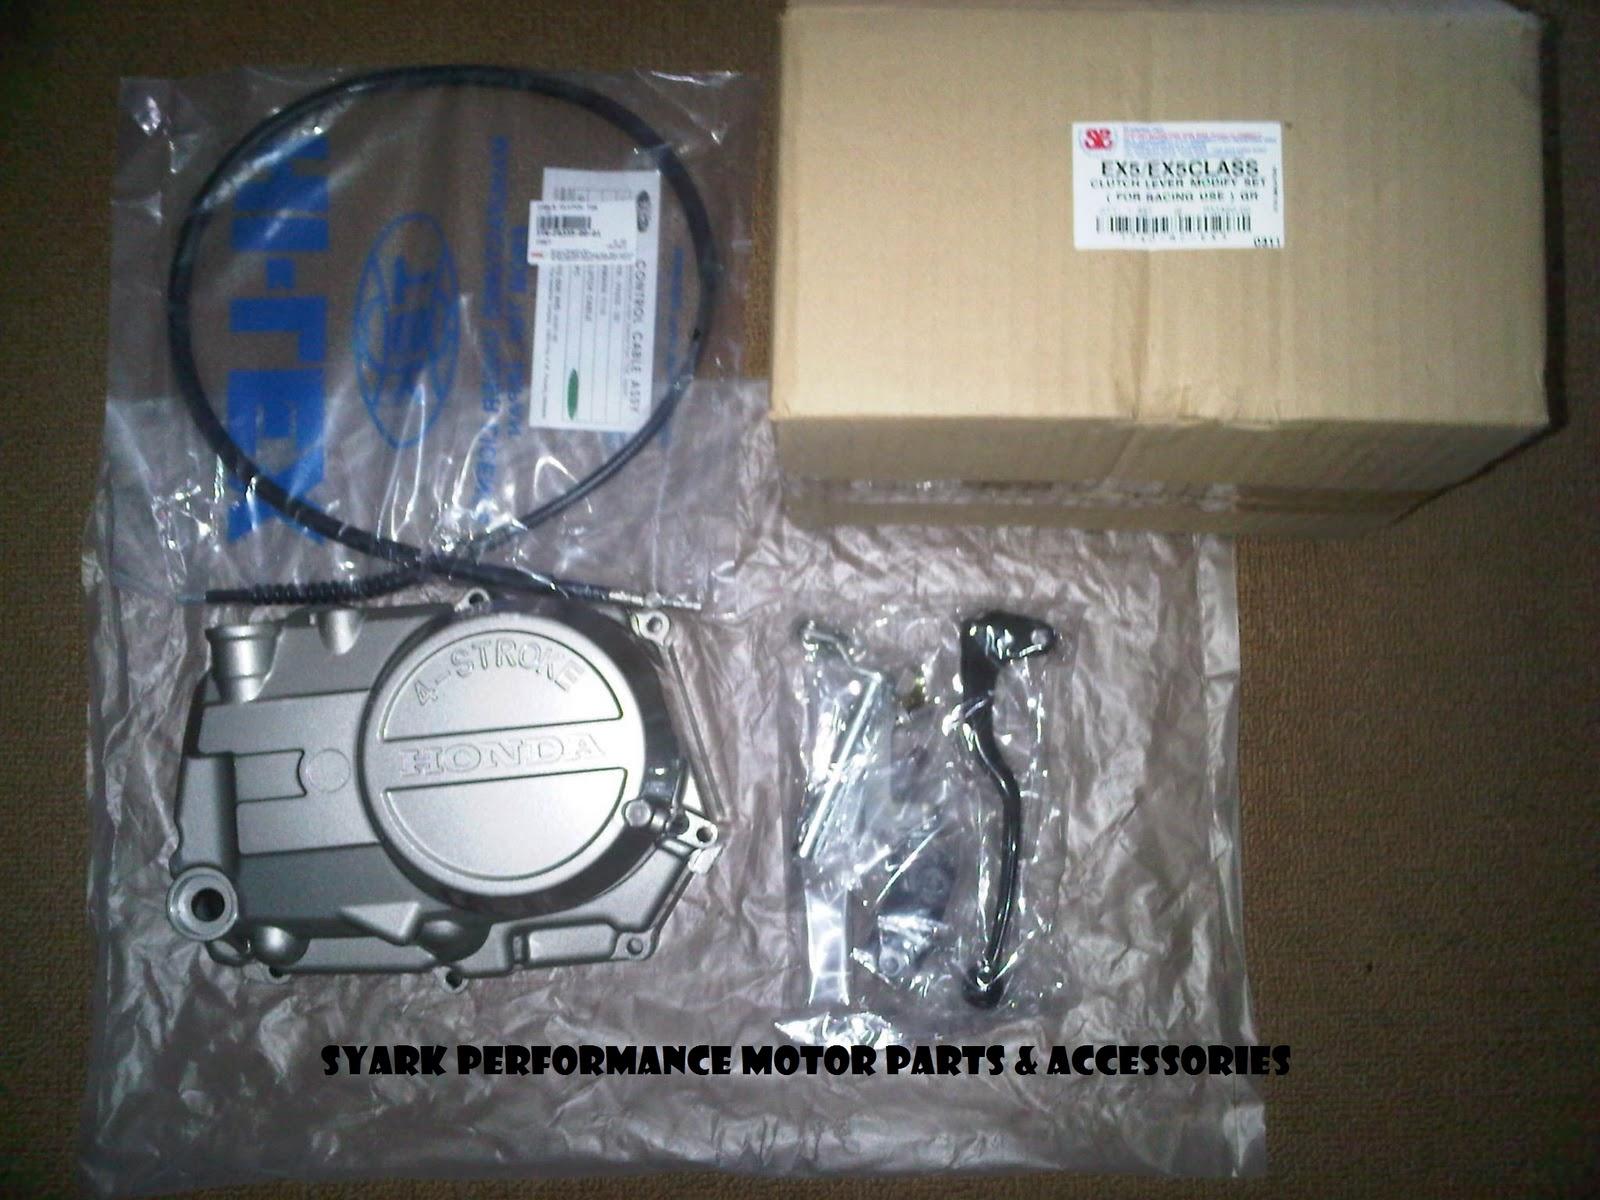 Wiring Diagram Honda Ex5 High Power 12v Electrical Of Z50jp Service Manual U2013 Fiat World